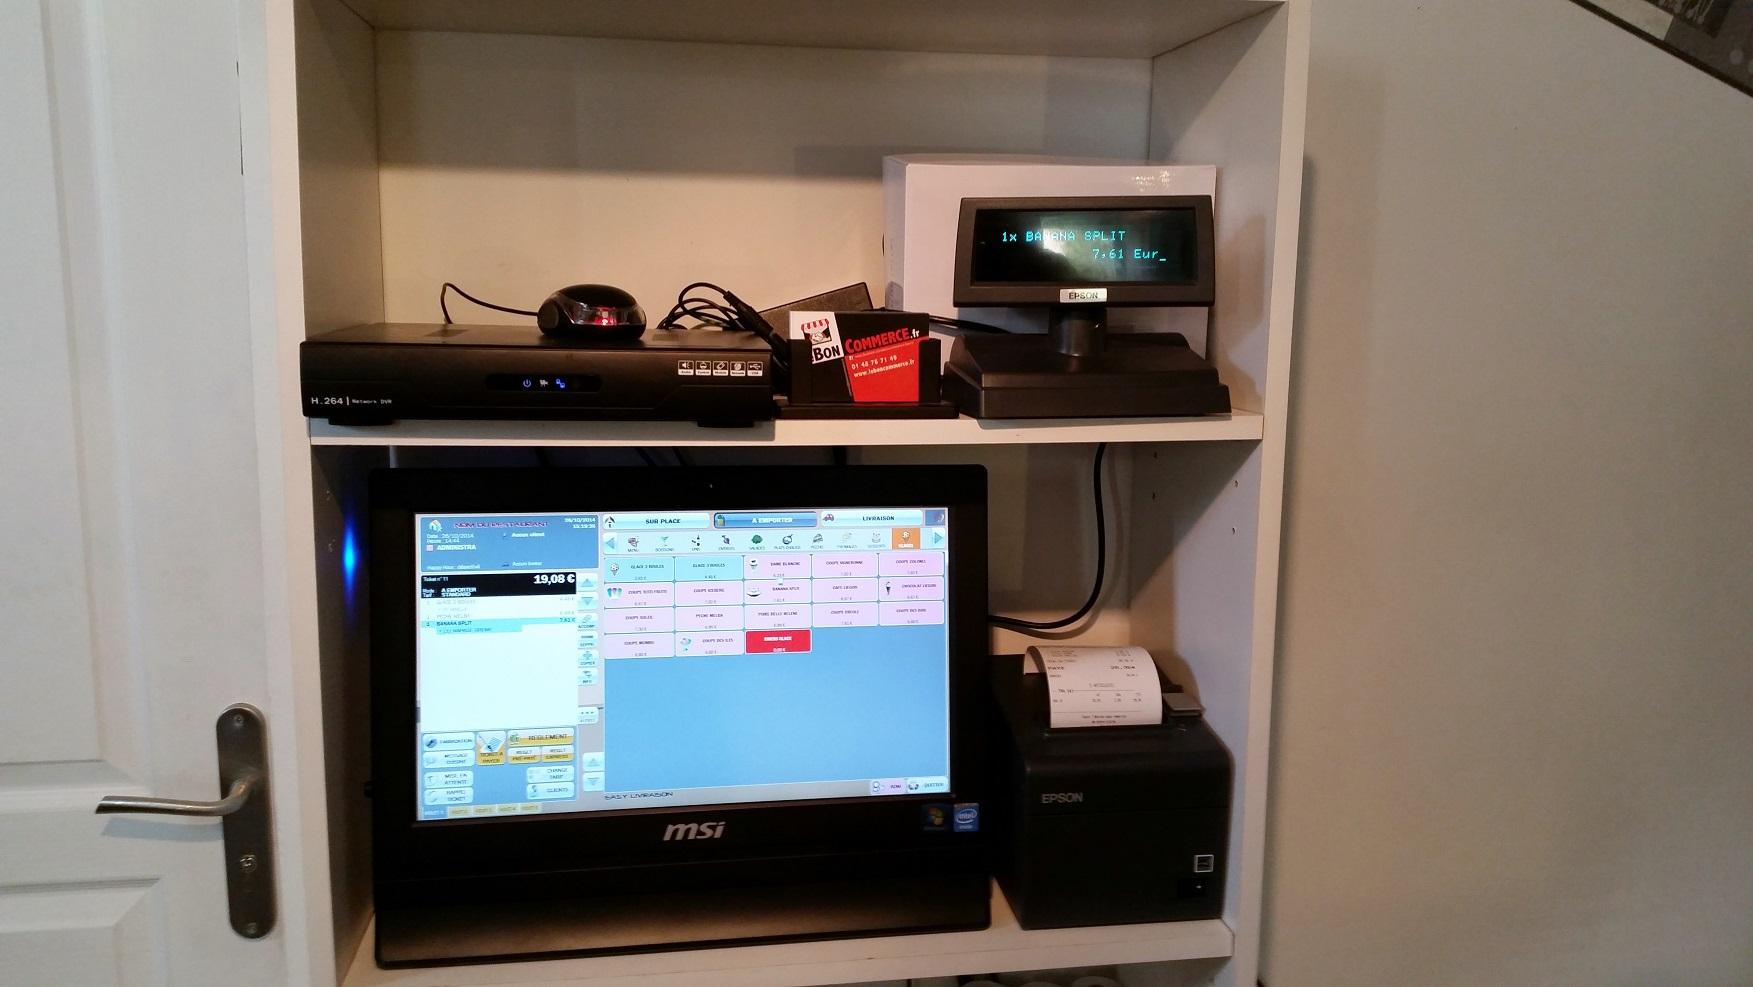 leboncommerce.fr-caisse-enregistreuse-tactile-easy-resto-showroom-le-bon-commerce